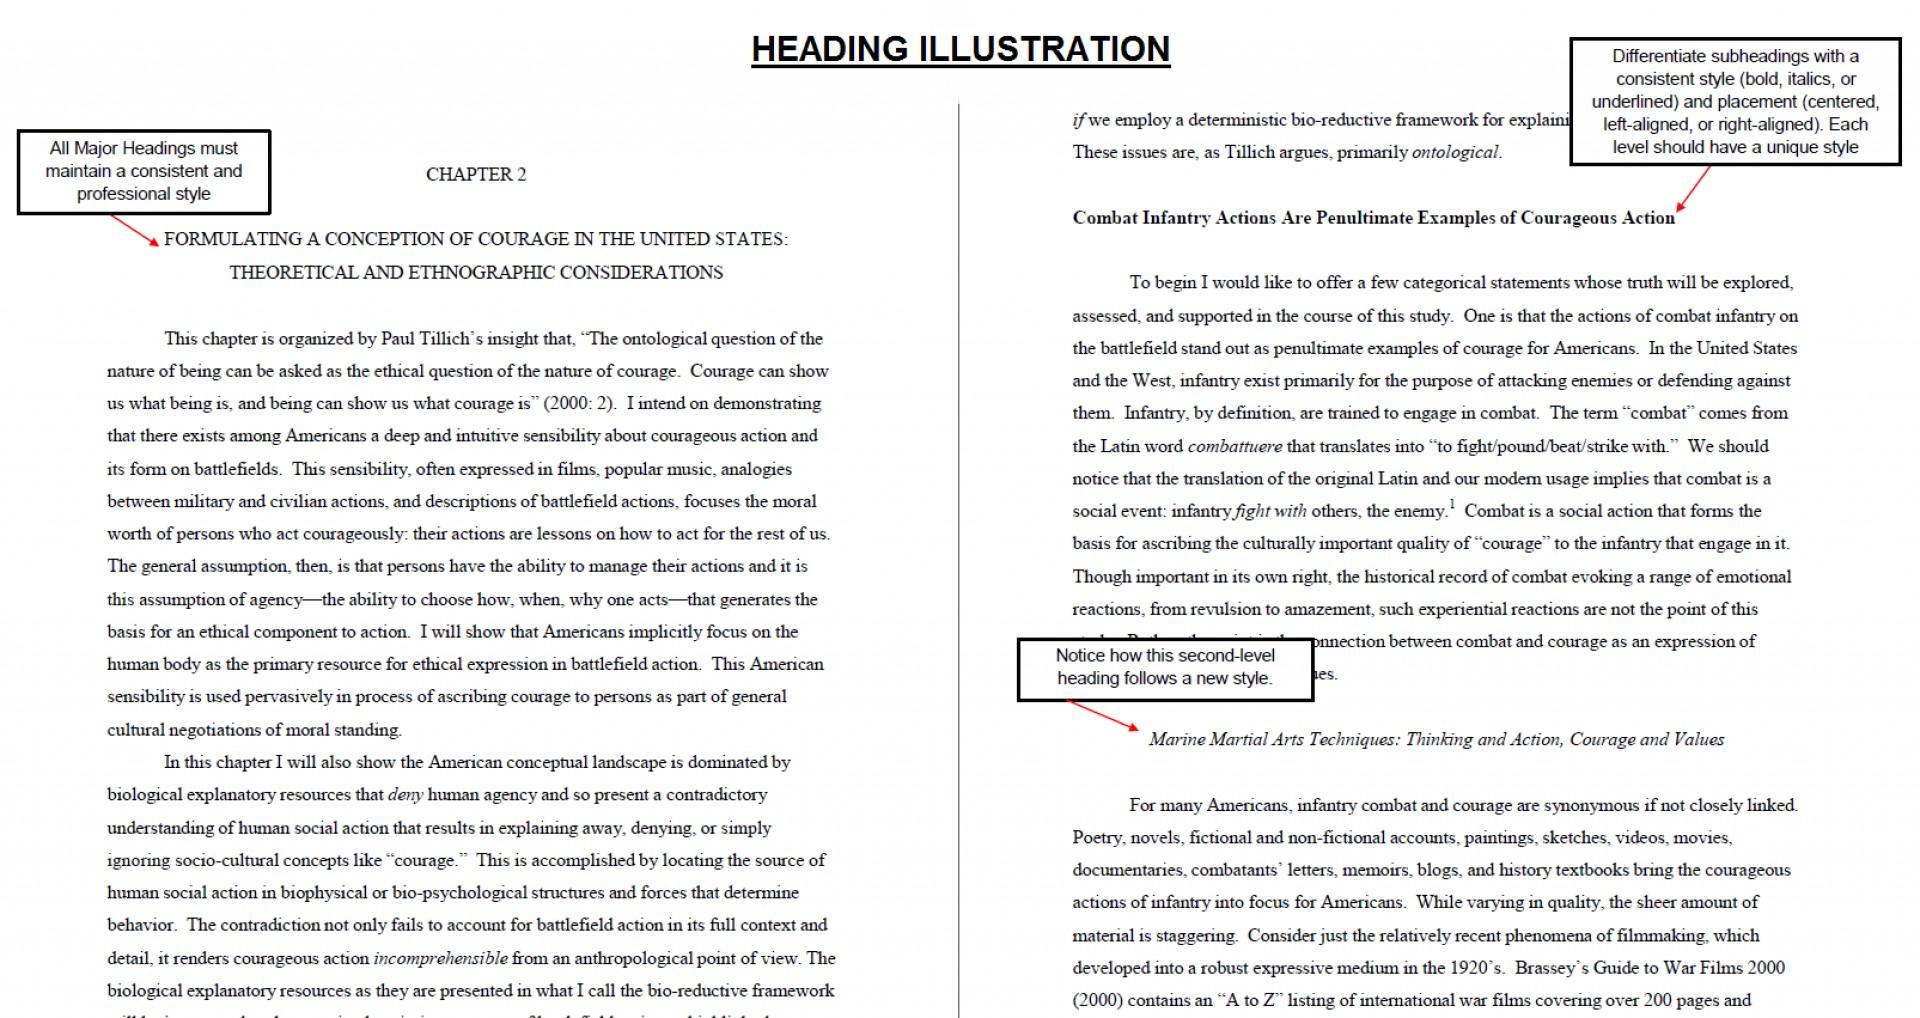 003 Essay Example Headingsillustration Png Surprising Subheadings Format Academic Writing 1920